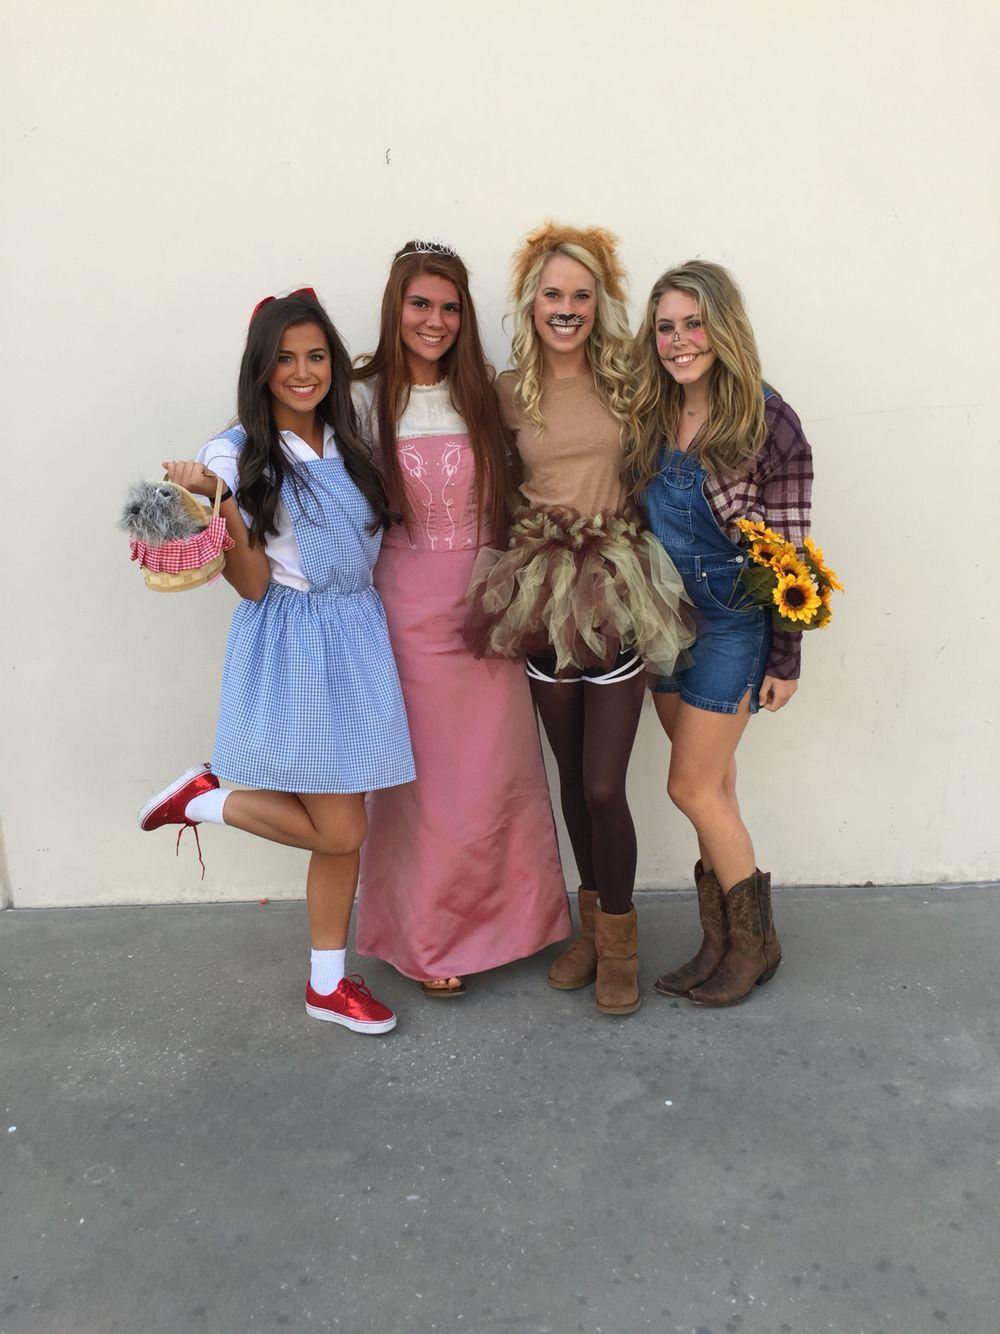 wizard of oz halloween group costume | halloween | pinterest